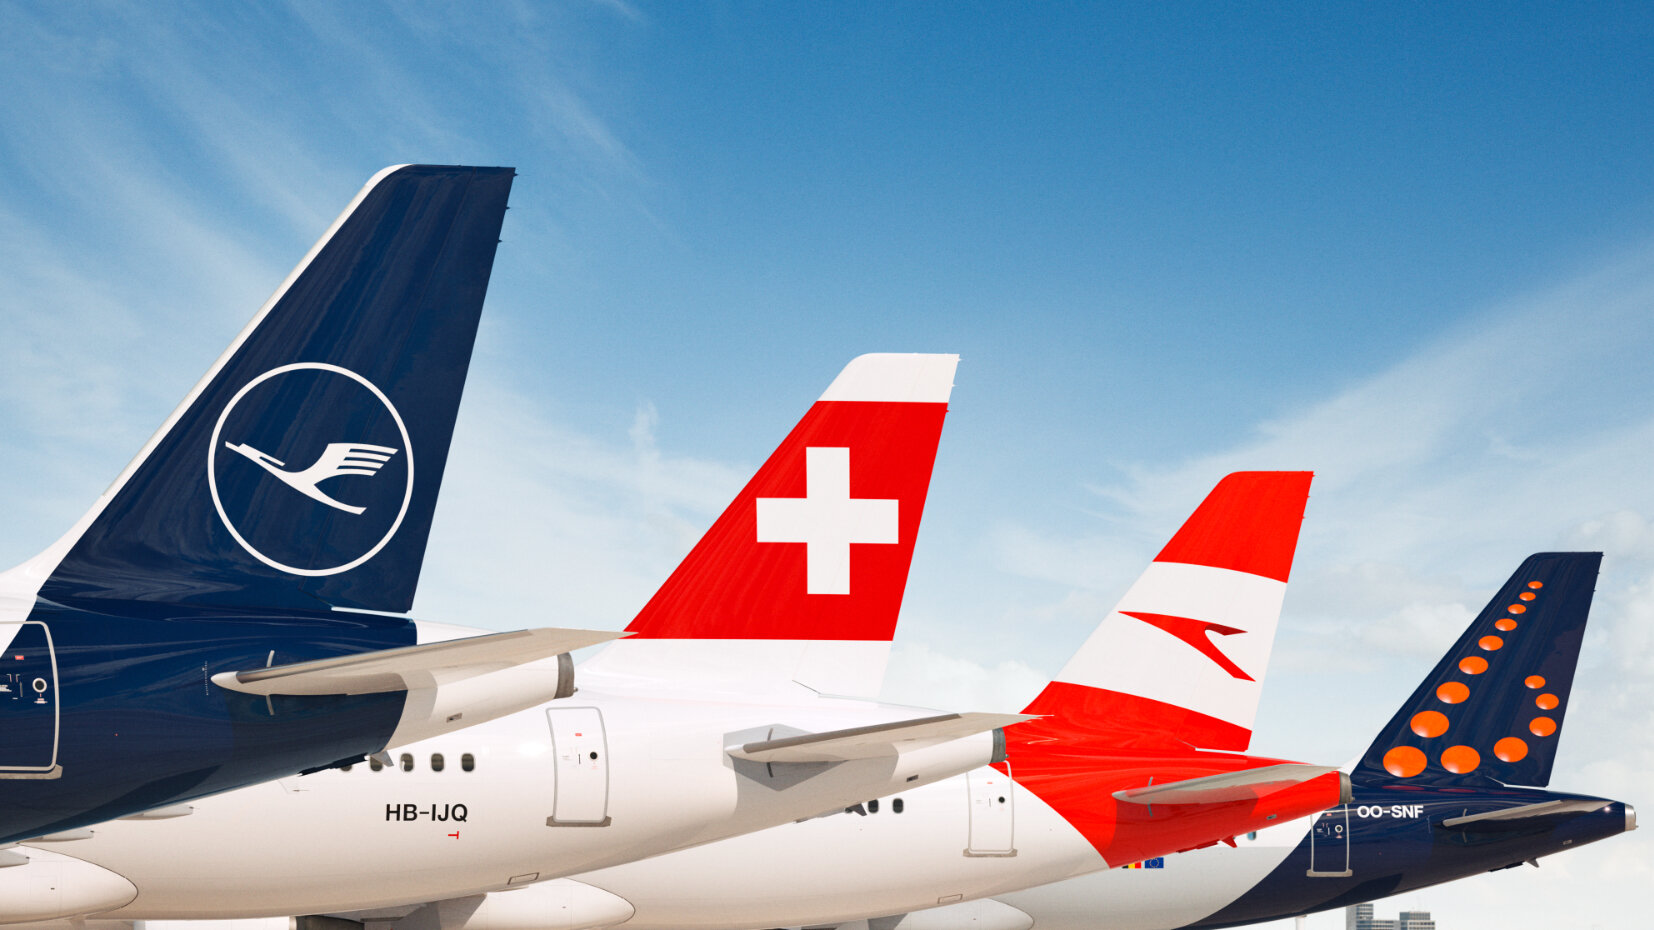 Lufthansa Group airlines: Over €2.5 billion in ticket costs reimbursed so far